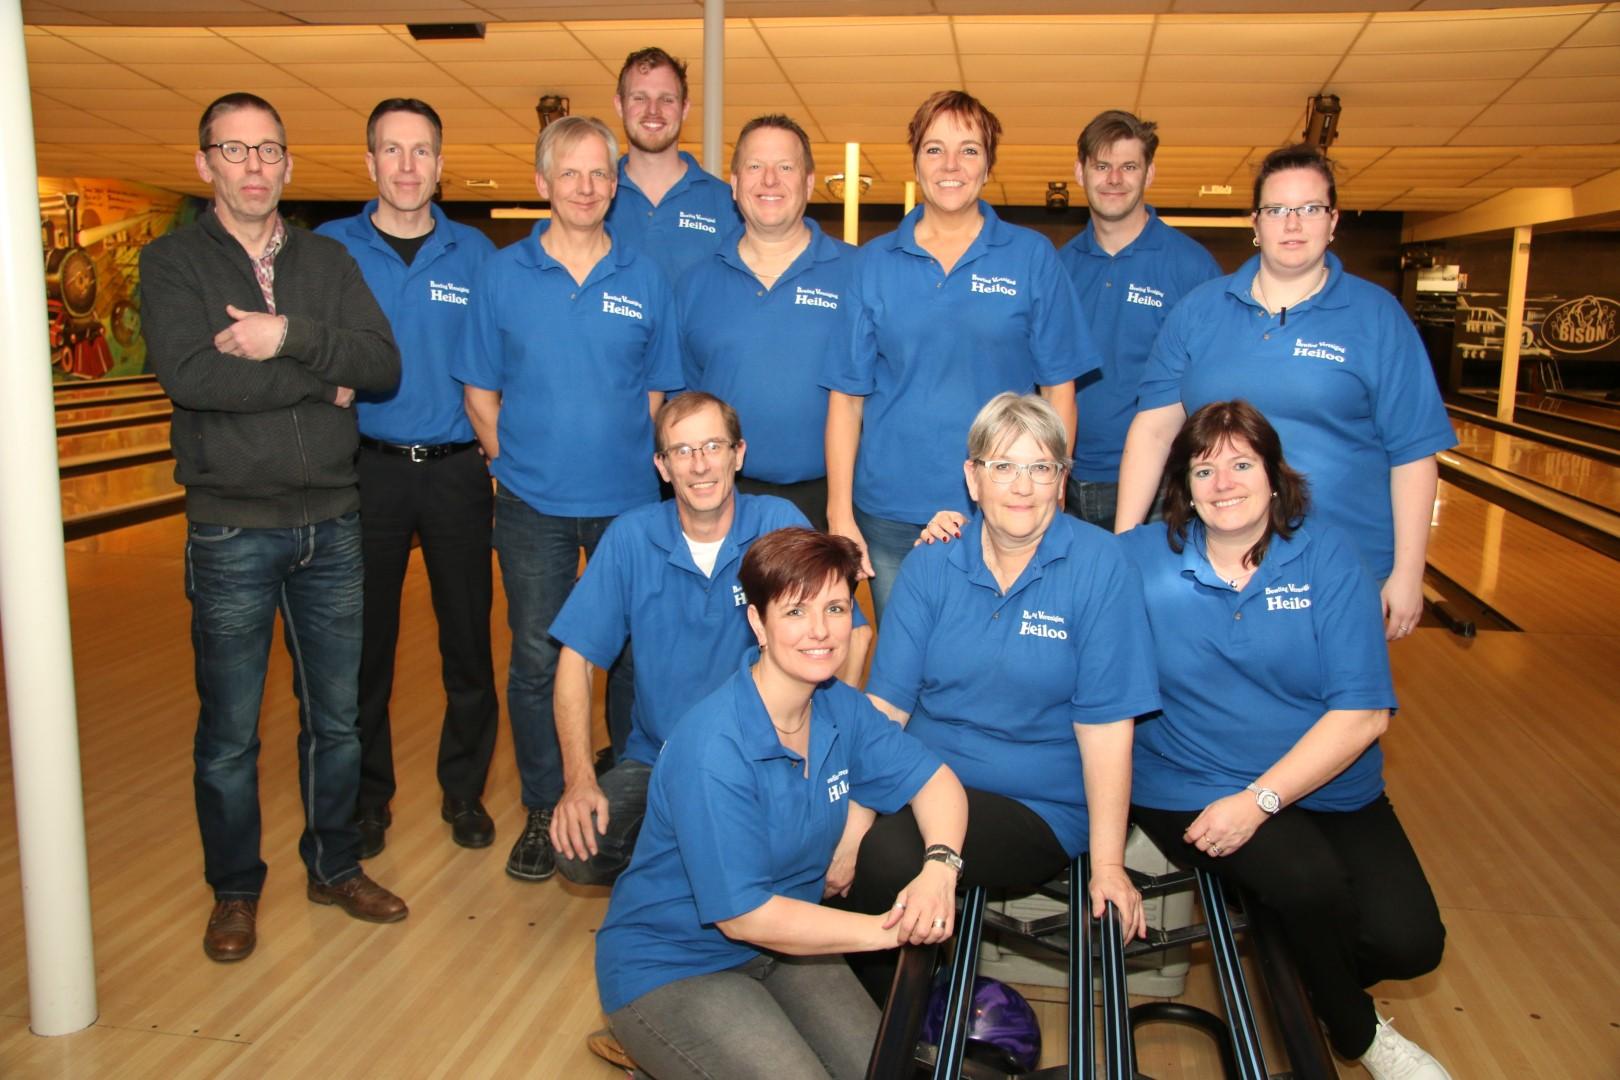 http://www.bowlingverenigingheiloo.nl/toernooizaken/foto's/2018_Stedenteam.jpg